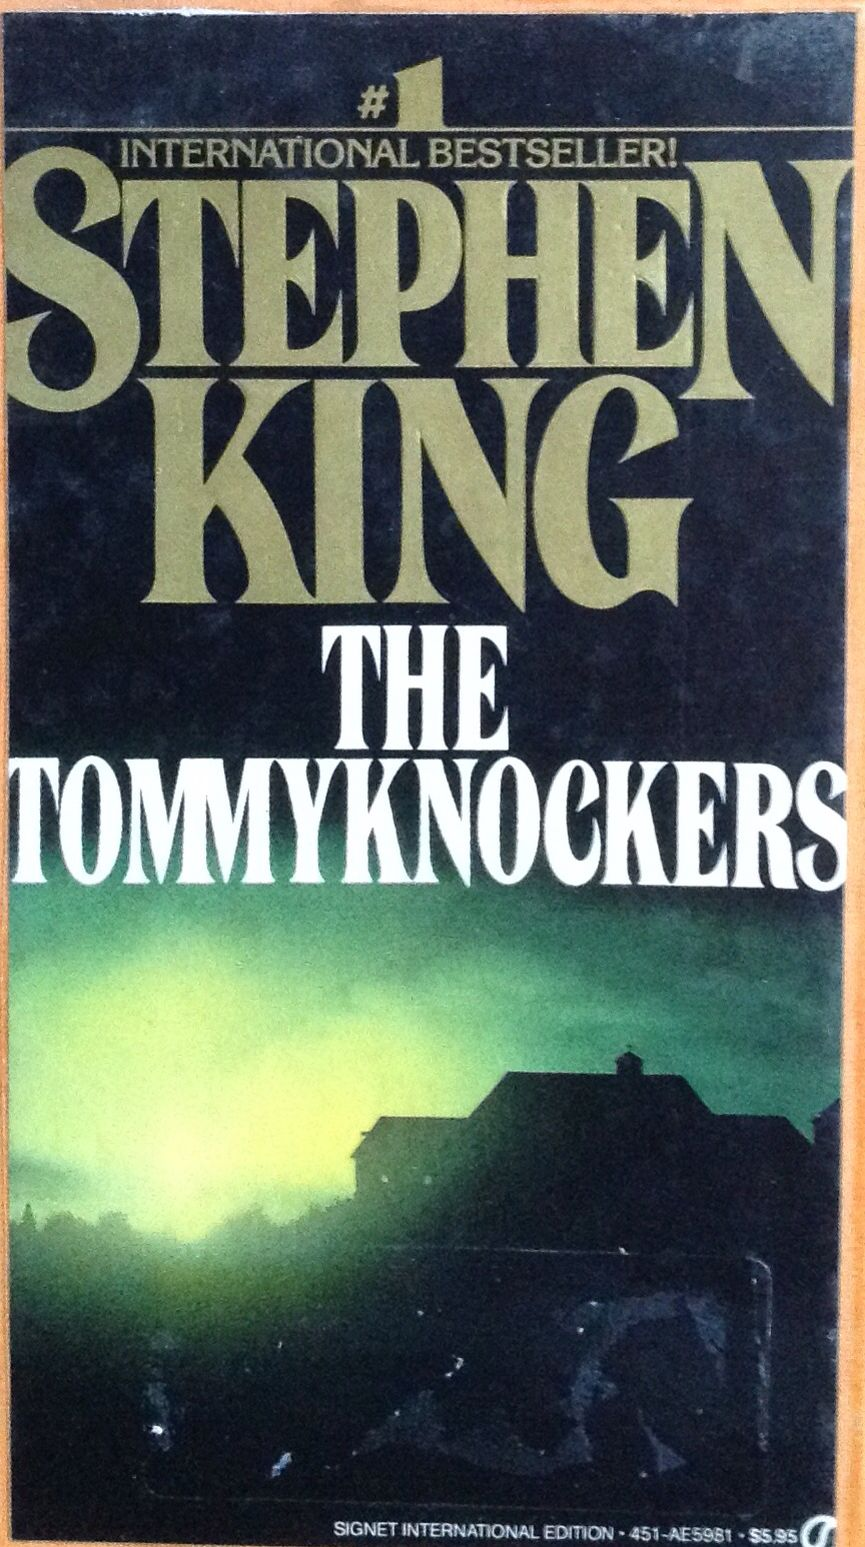 Stephen King: de gloed (engels) | Mijn boekenkast: Stephen King ...